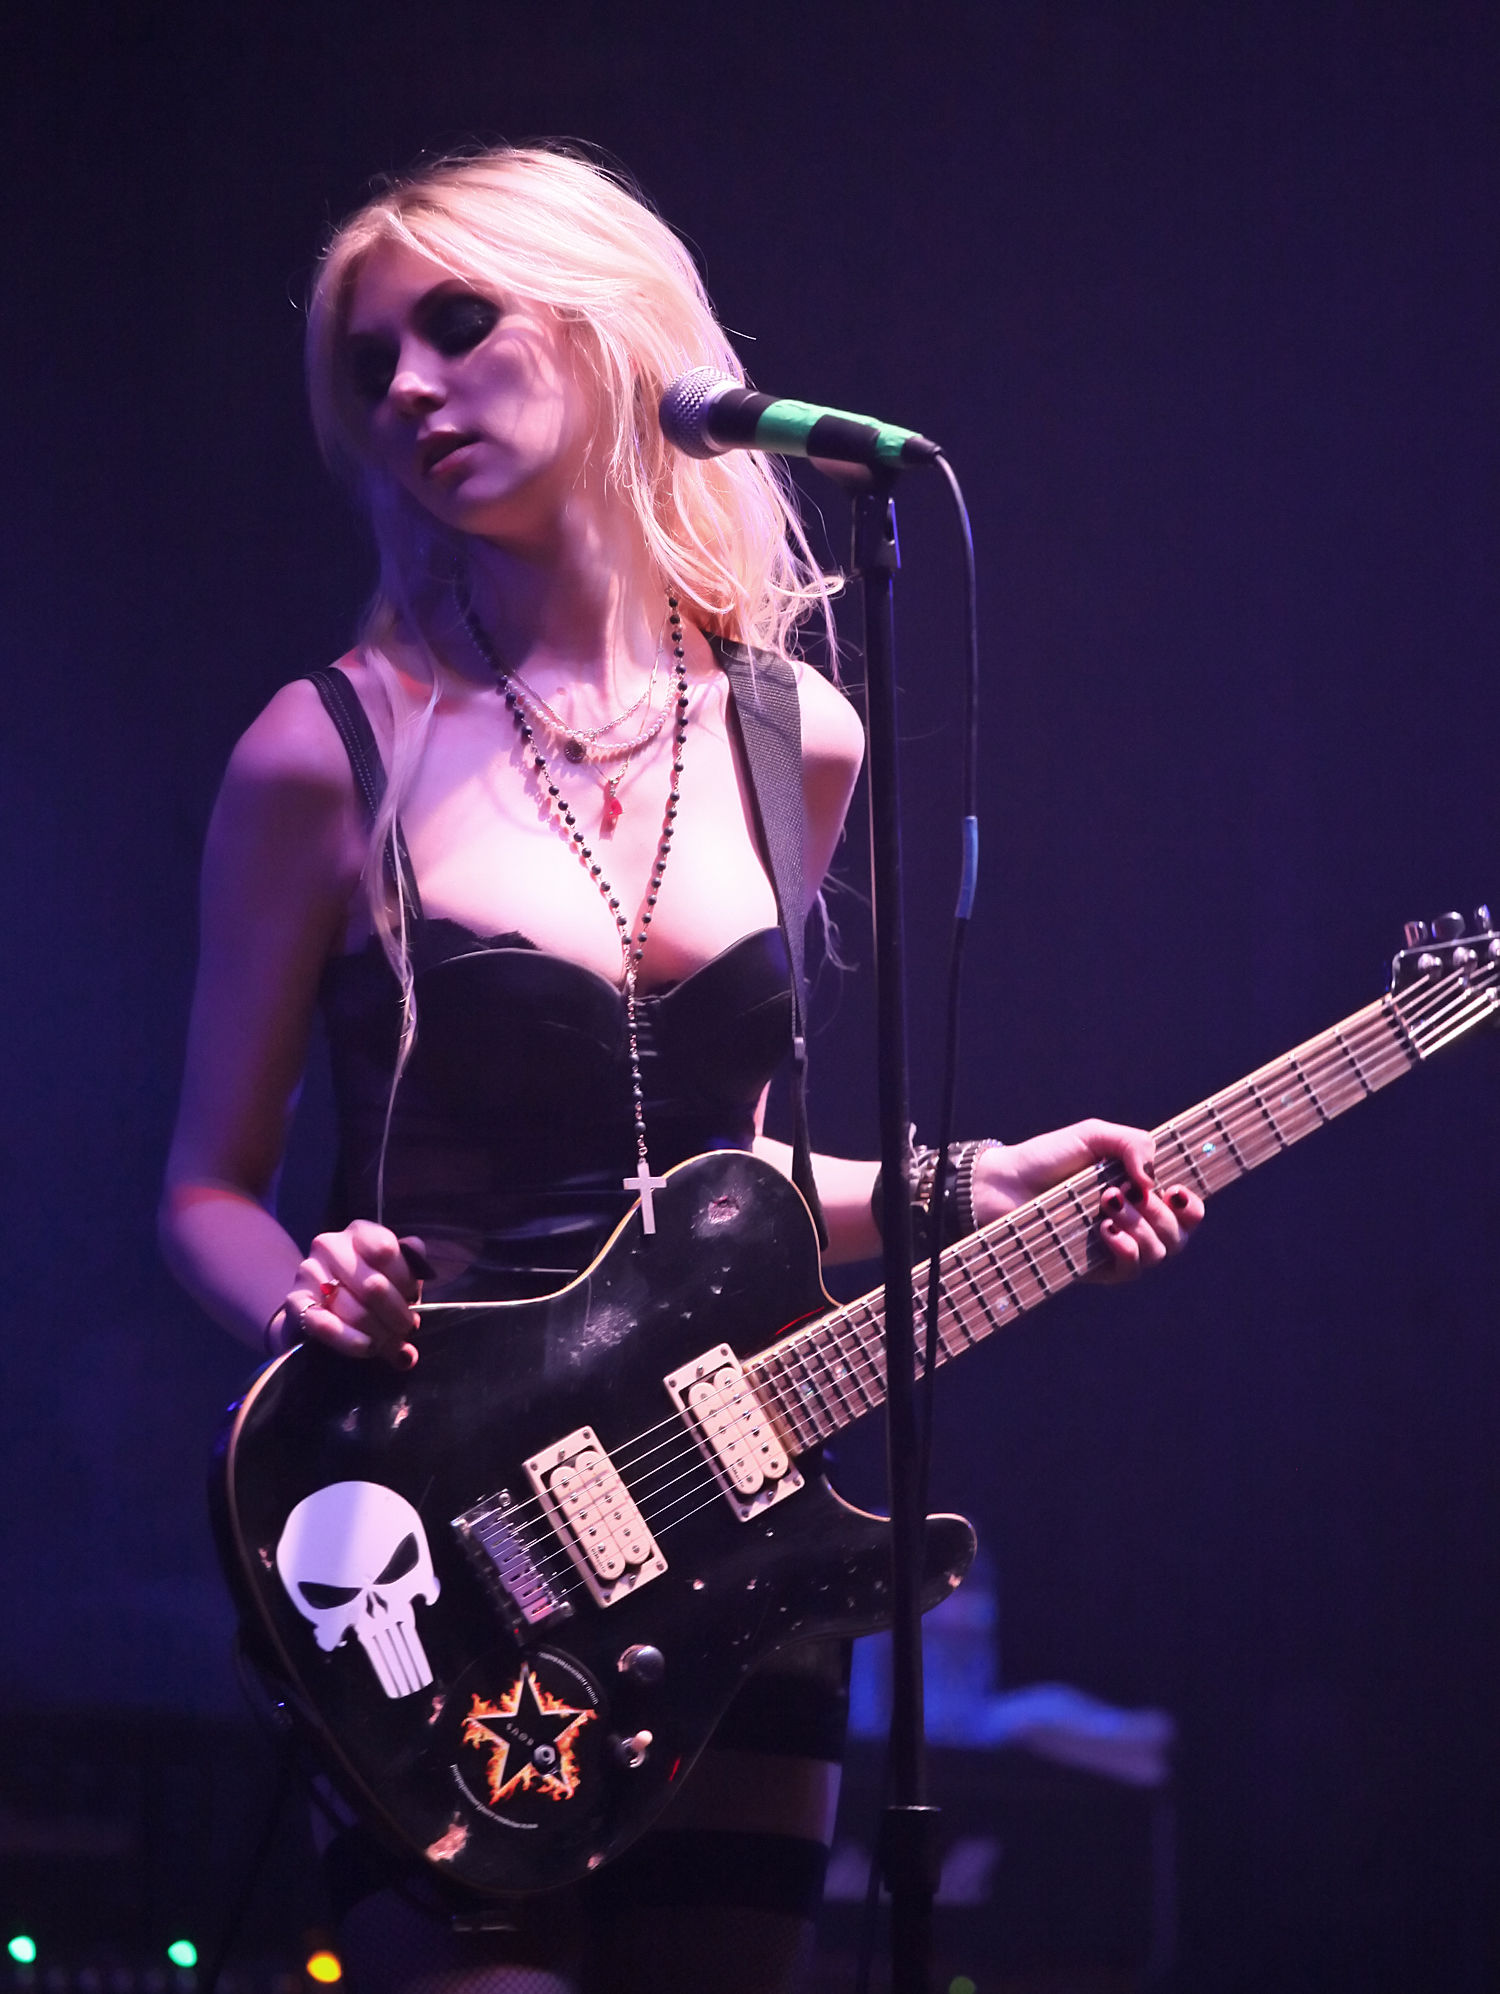 Photo of Taylor Momsen: Actress, singer-songwriter, model